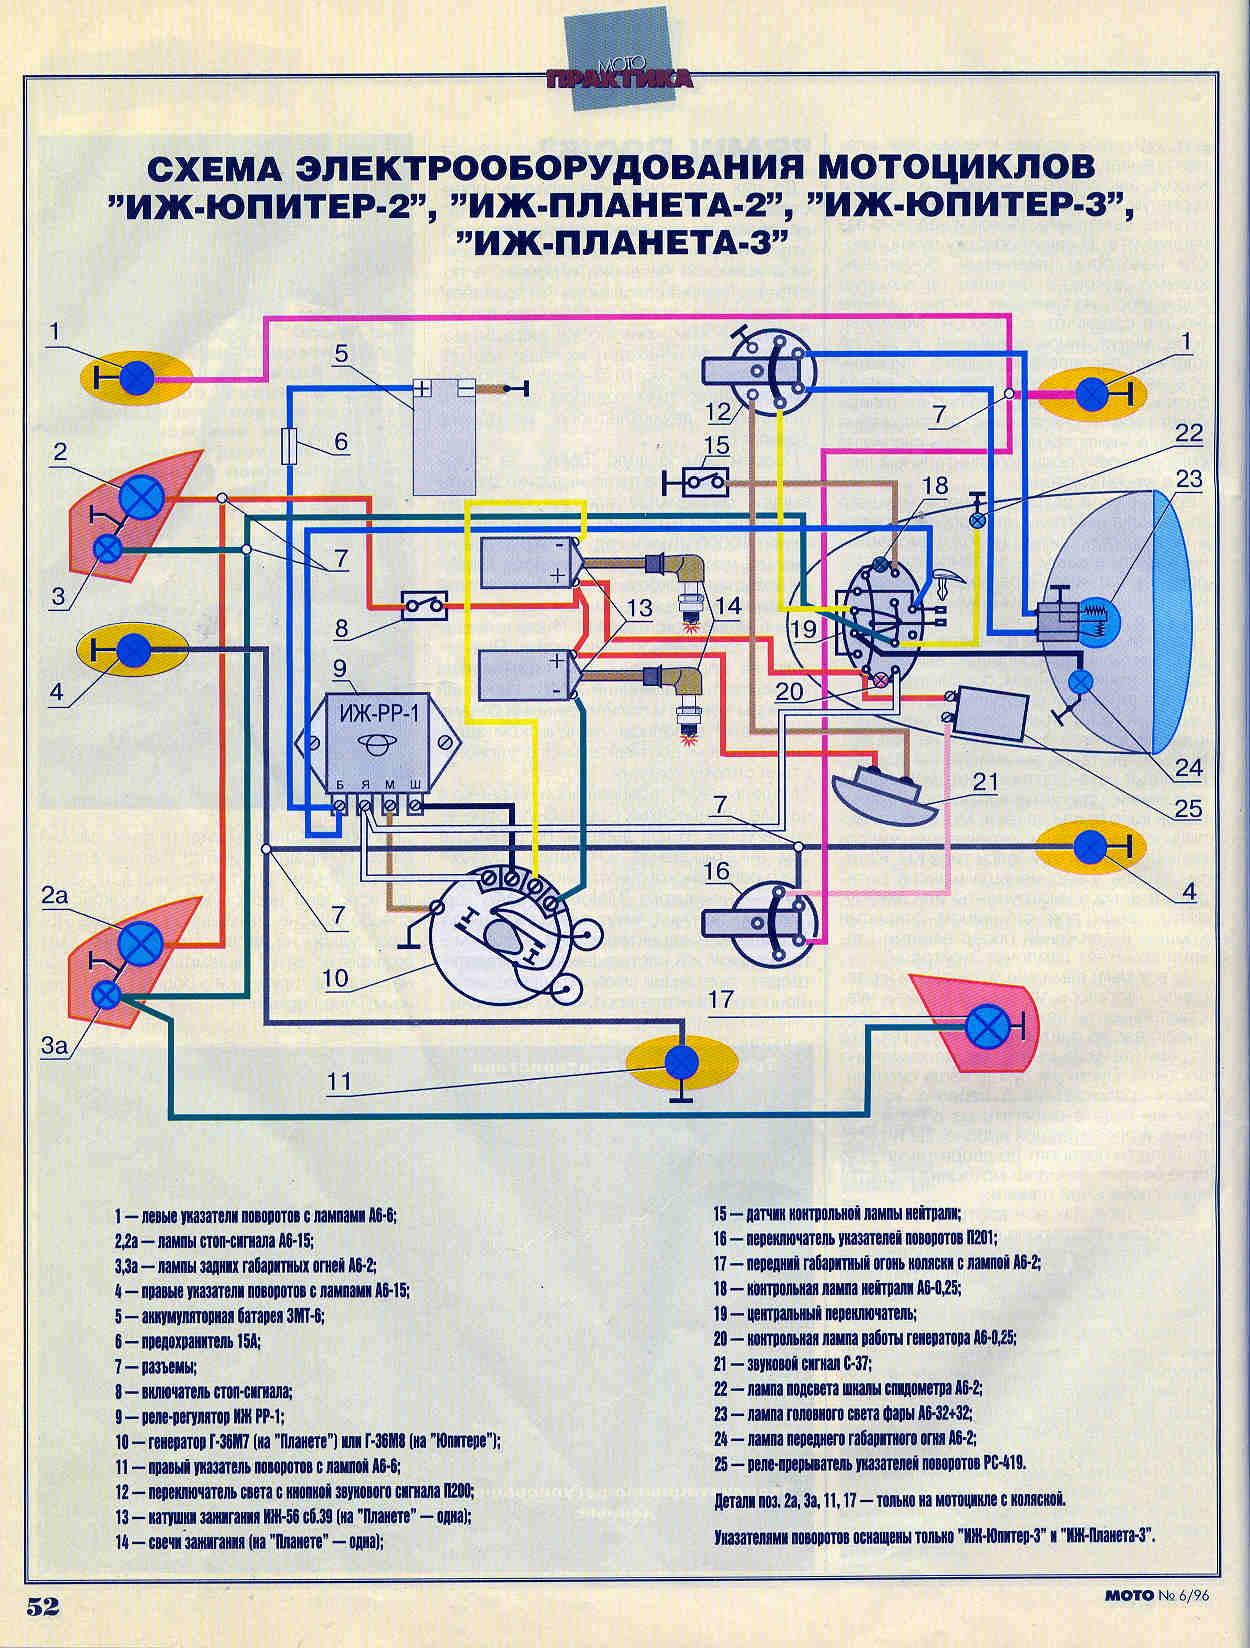 Теплая кофта на пуговицах схема и описание